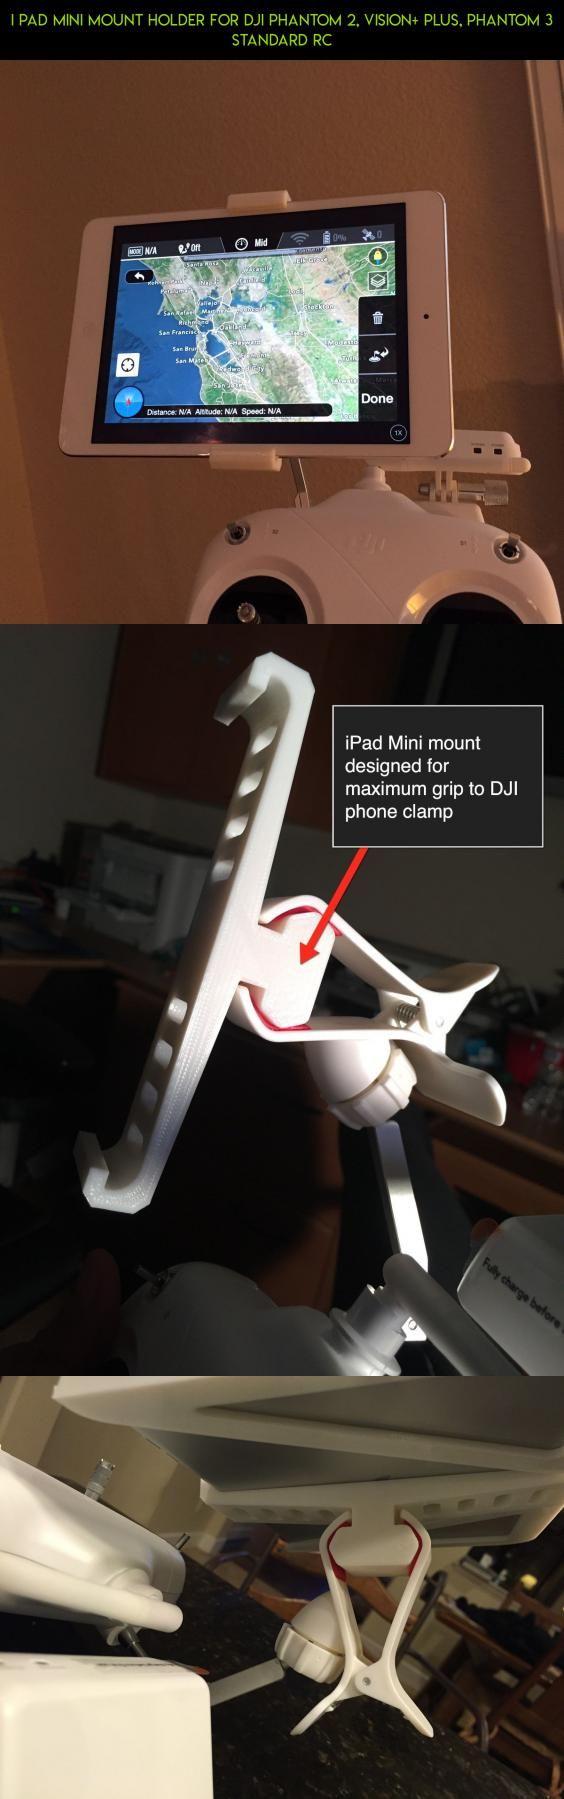 i Pad Mini mount holder for DJI Phantom 2, Vision+ Plus, Phantom 3 Standard RC #3 #racing #camera #gadgets #technology #tech #holder #drone #plans #fpv #products #parts #kit #dji #shopping #phantom #standard